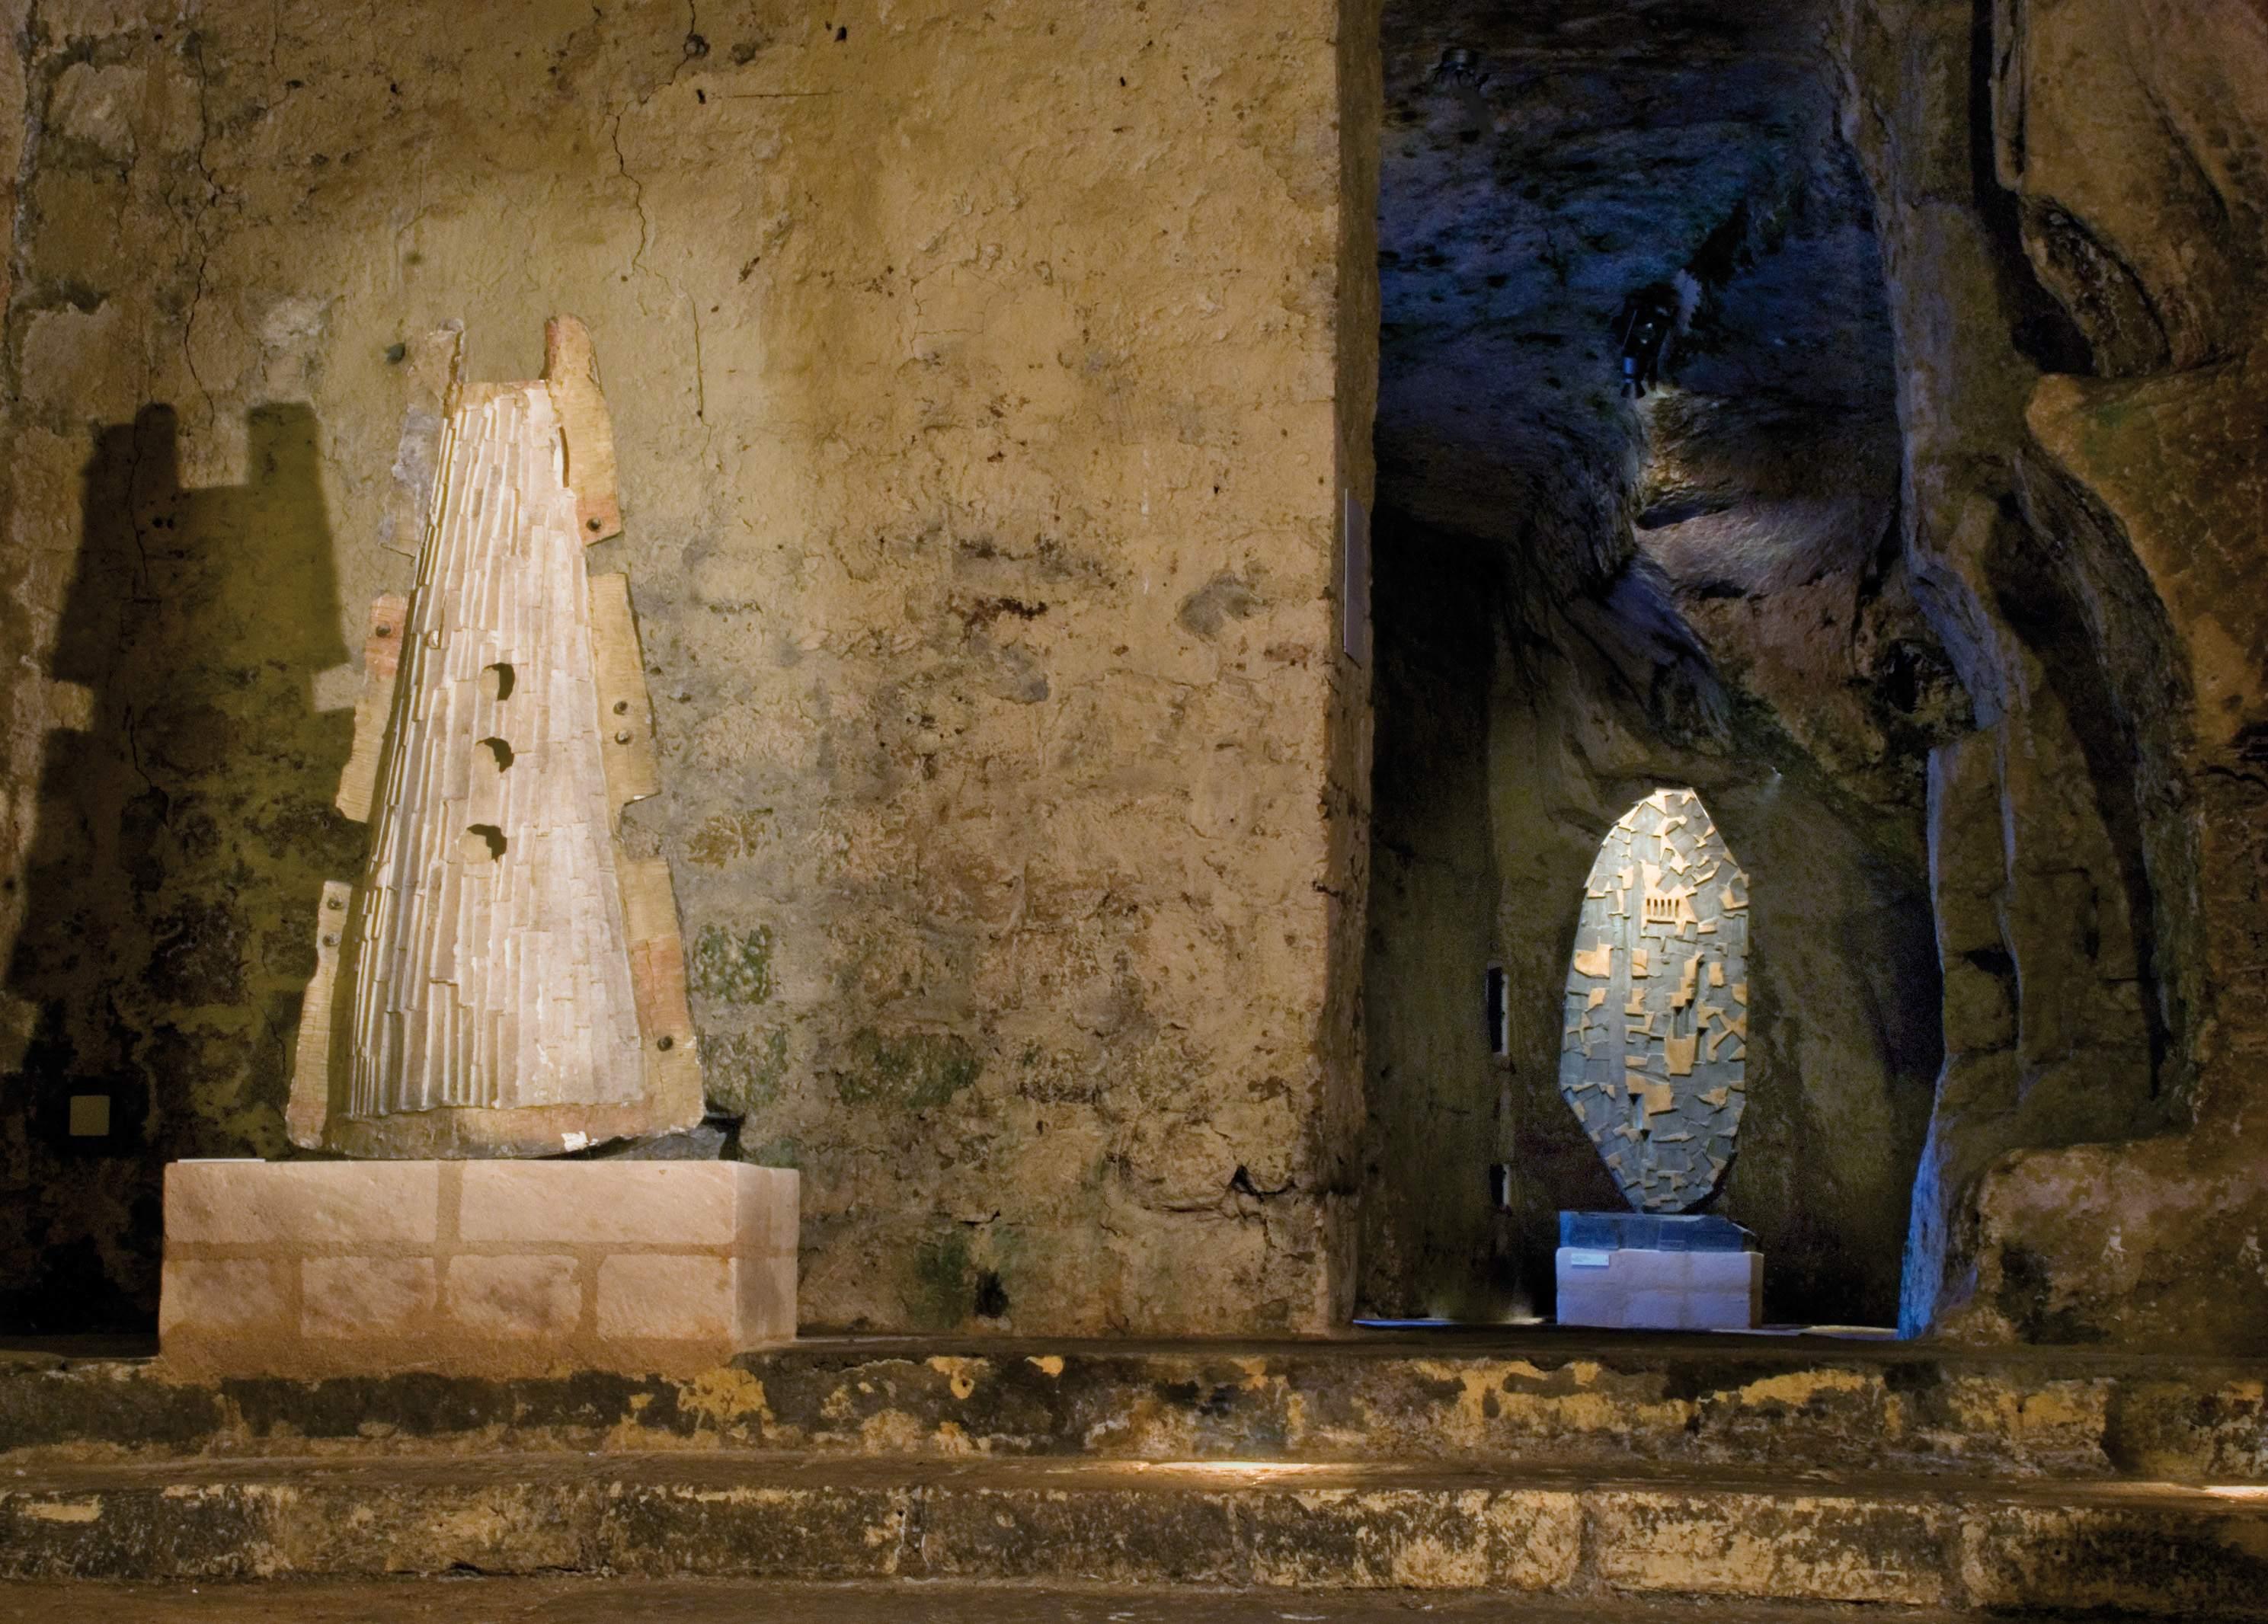 Antologica di Kengiro Azuma nelle chiese rupestri di Matera (a cura di Giuseppe Appella, 2010)